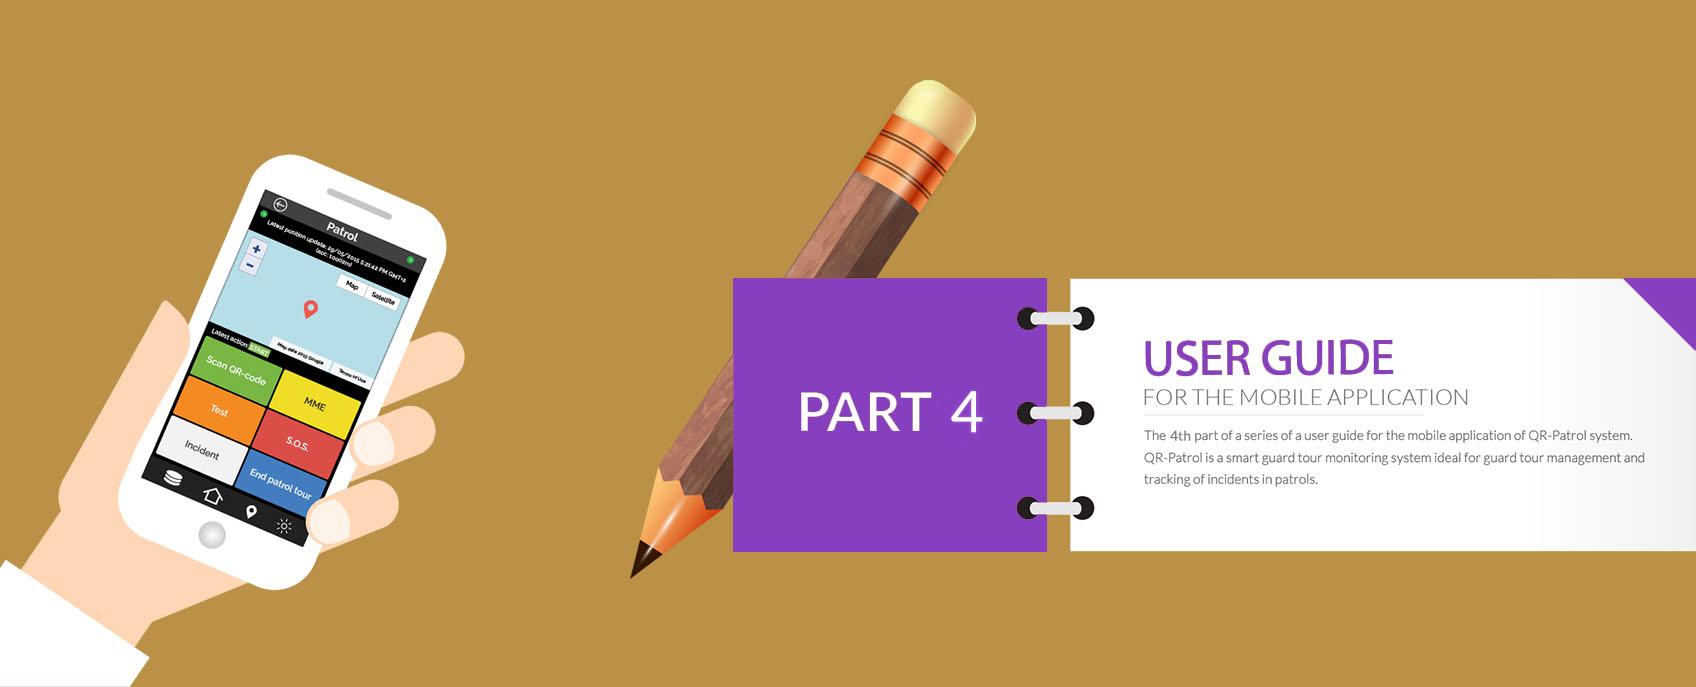 mobile-qr-patrol-user-guide-part-4